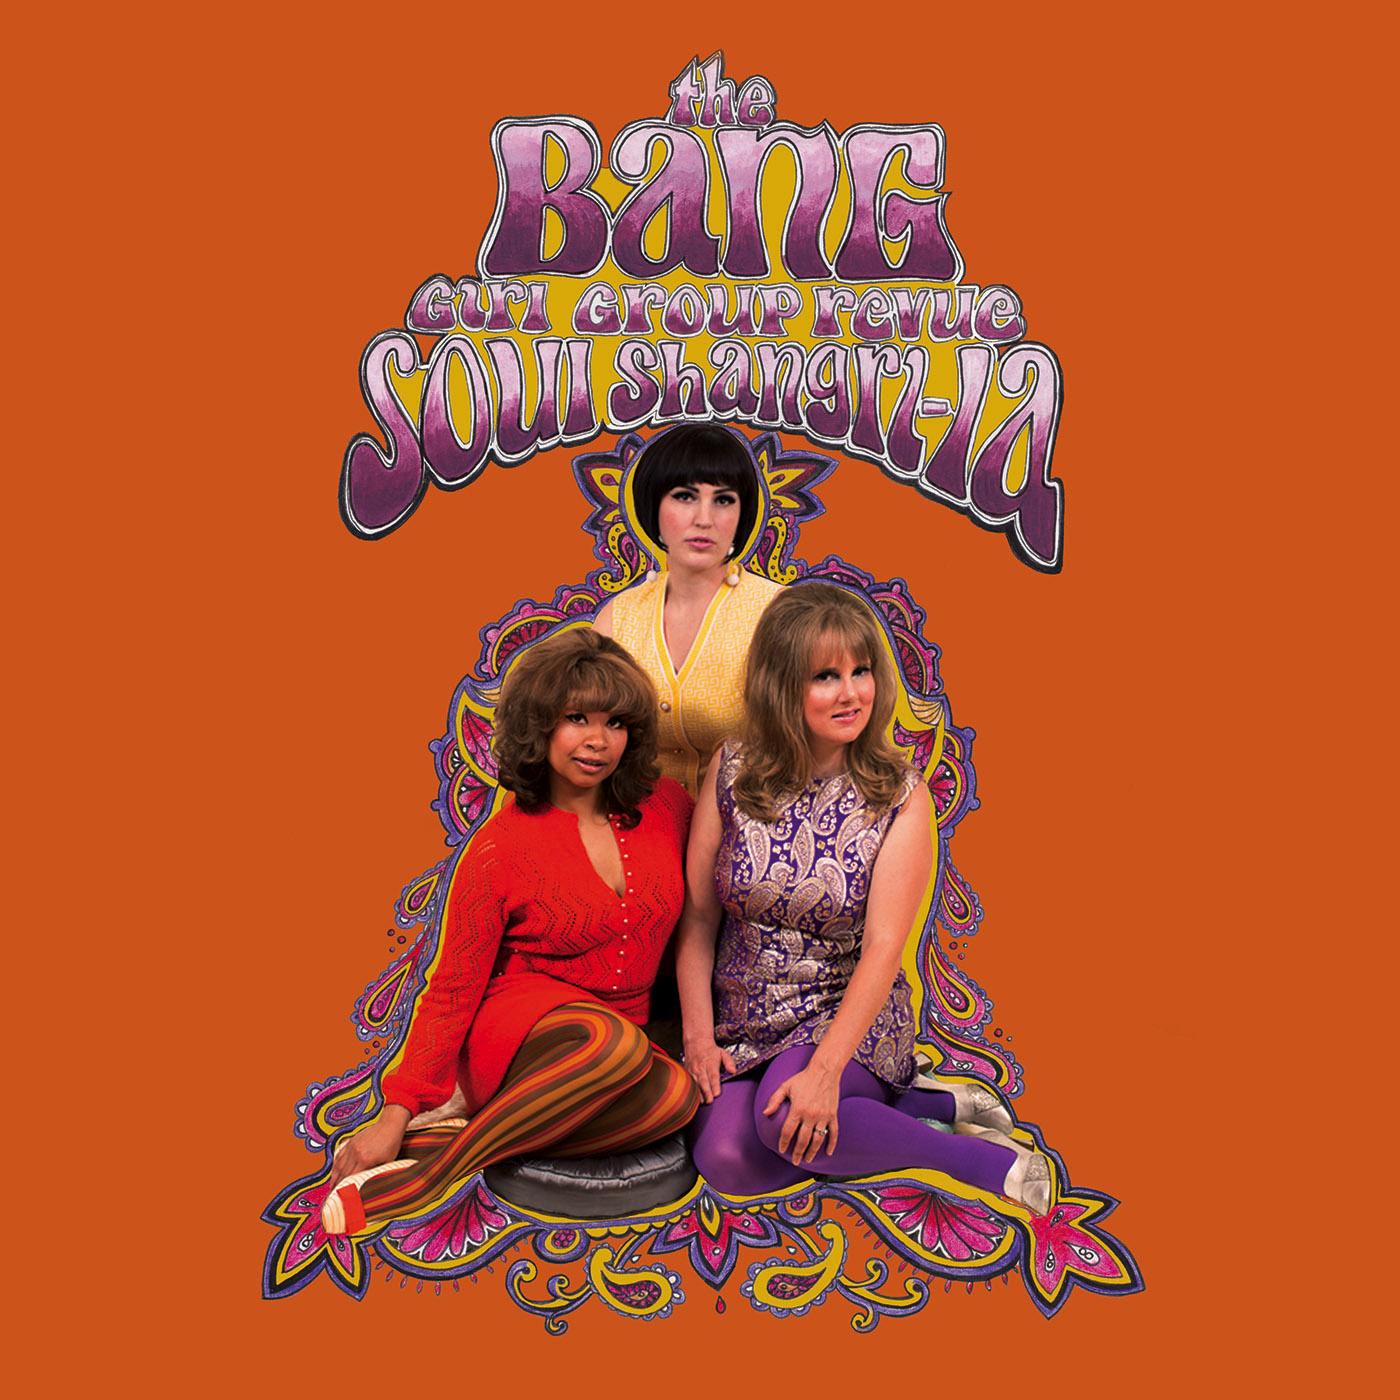 The Bang Girl Group Revue Soul Shangri La Vinyl Edition